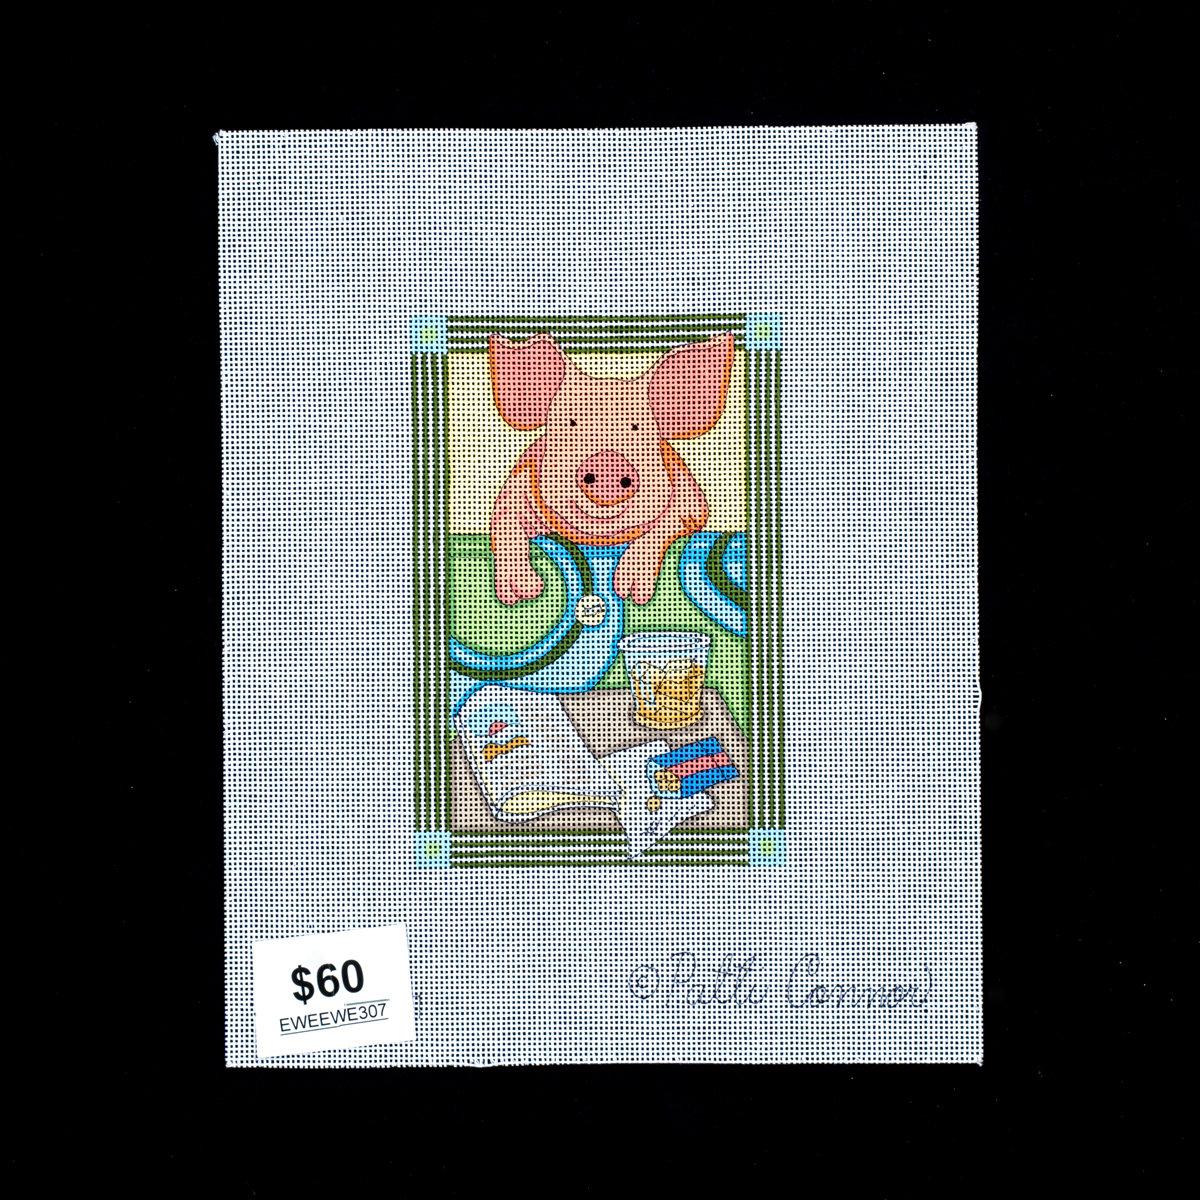 Ewe & Eye, Pig, EWE307